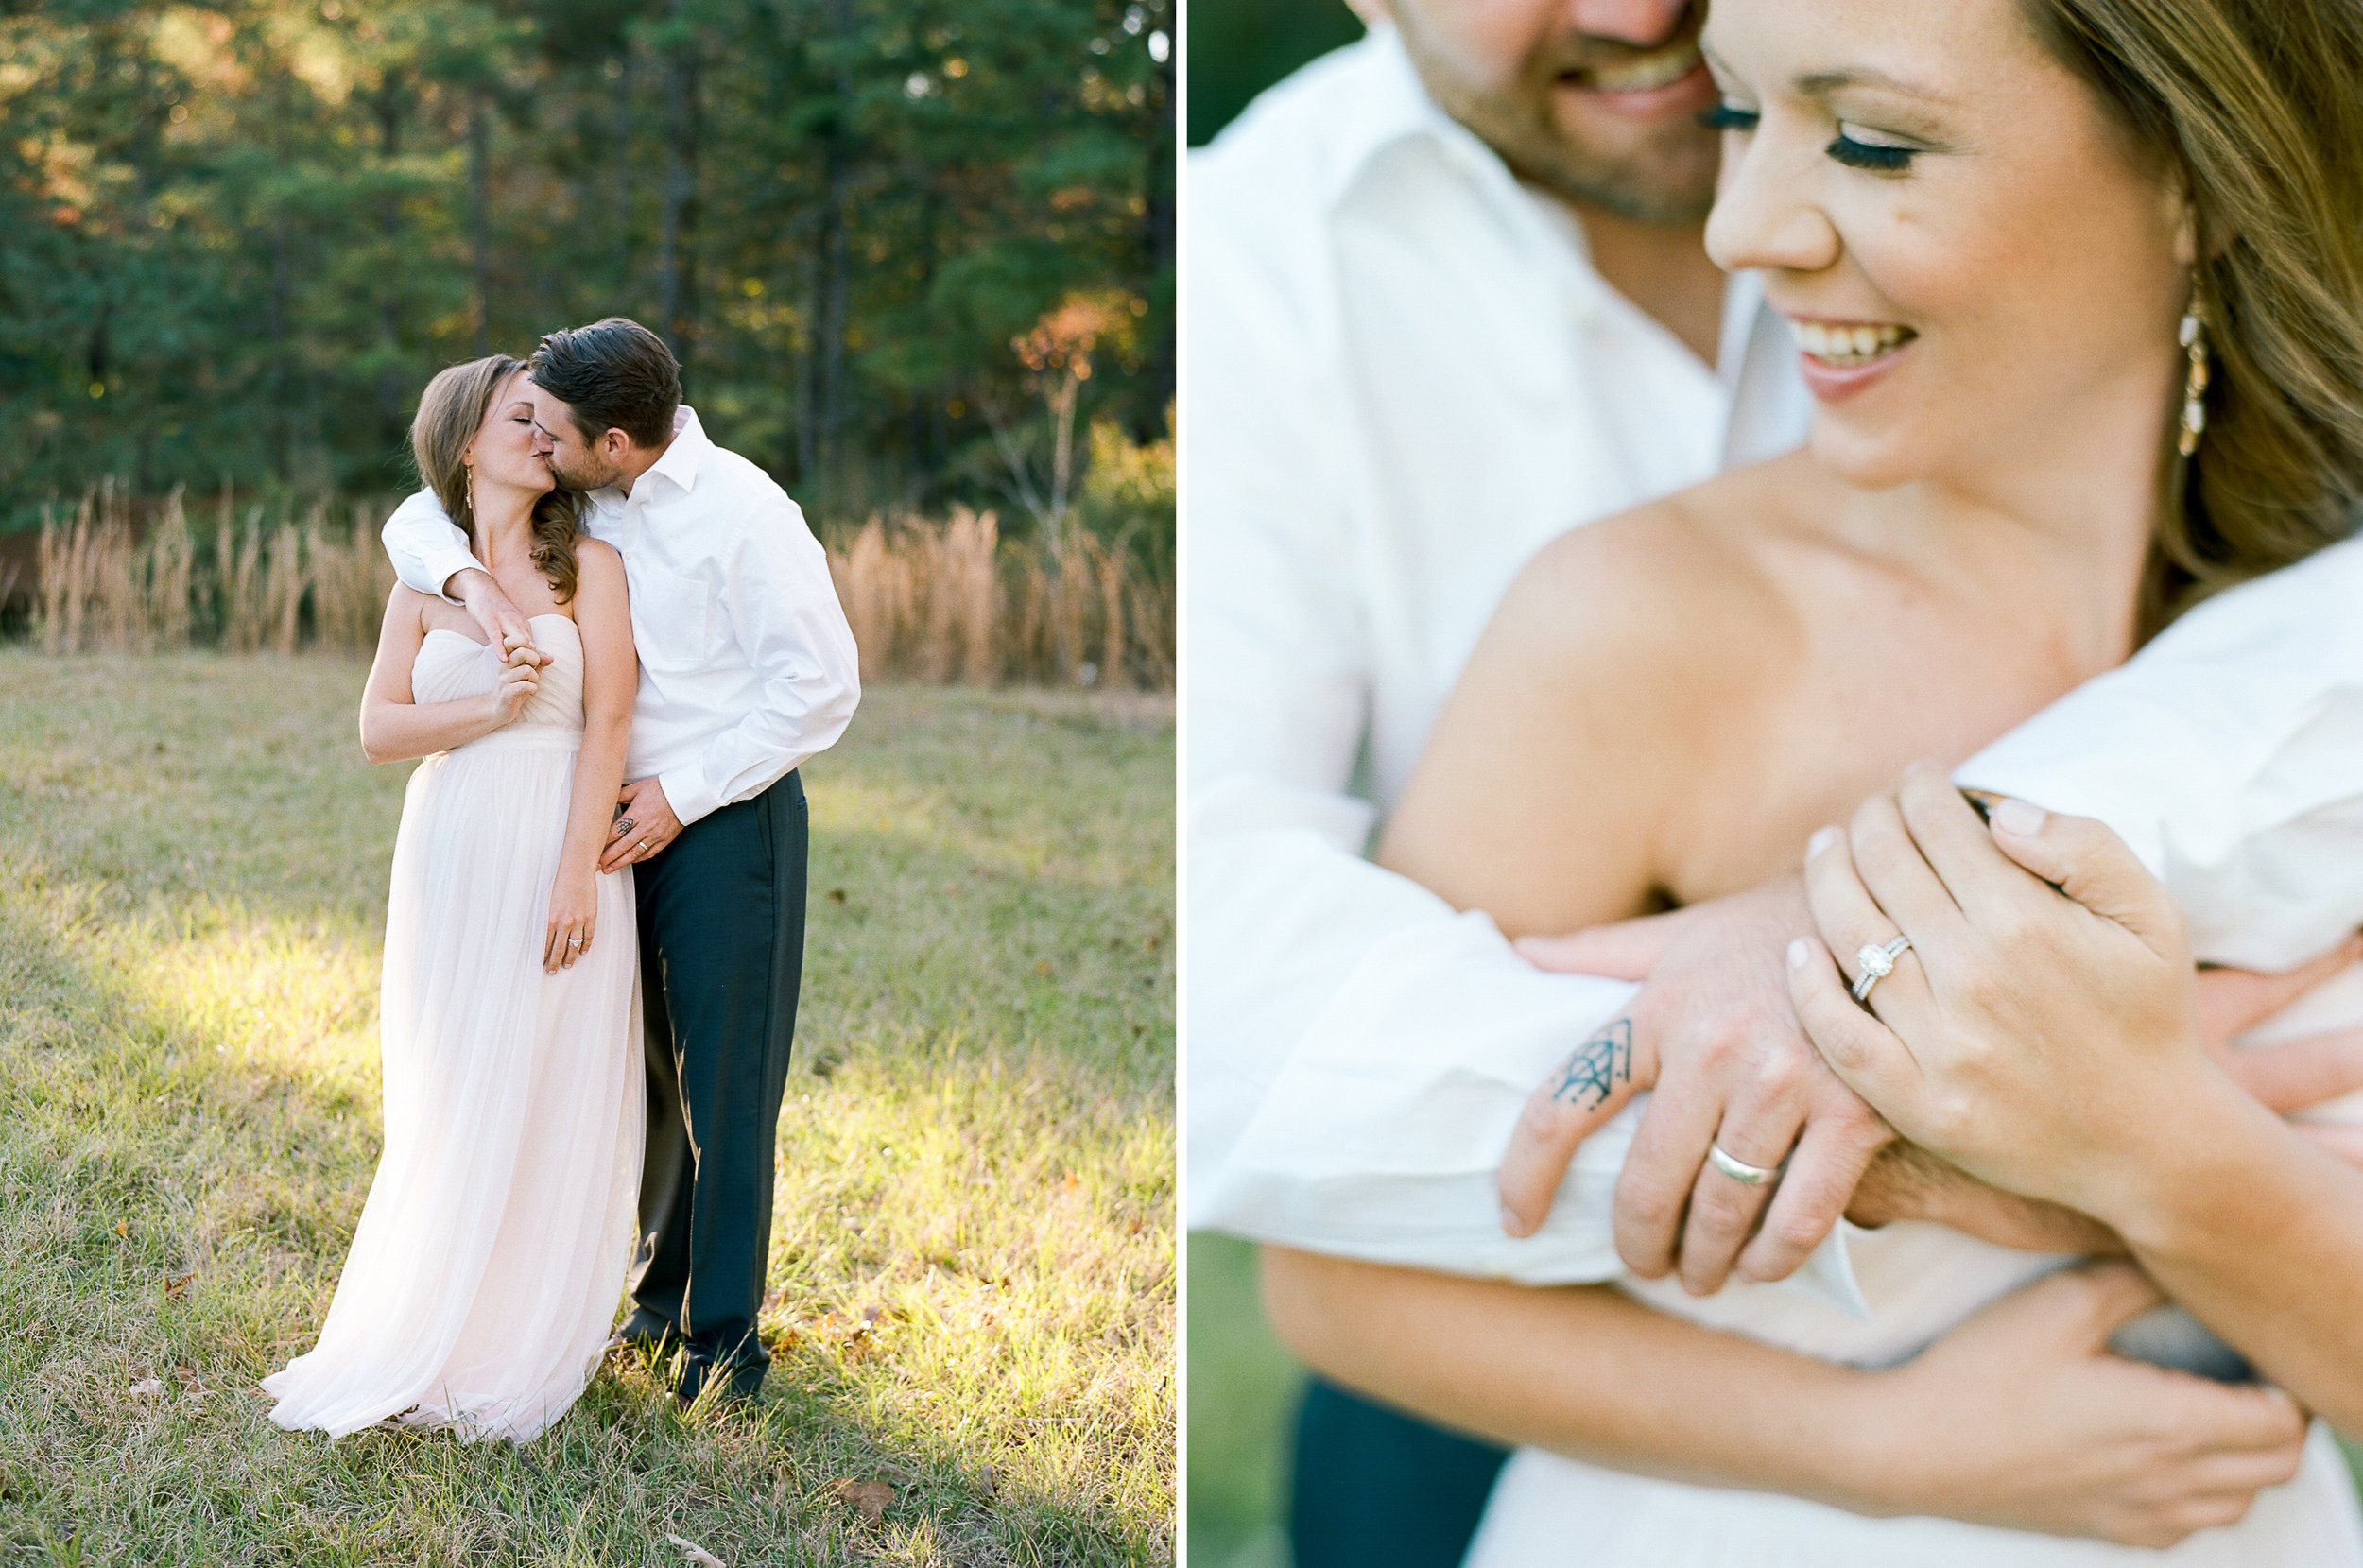 dana-fernandez-photography-houston-wedding-photographer-portraits-engagements-anniversary-session-film-photographer-austin-wedding-photographer-110.jpg